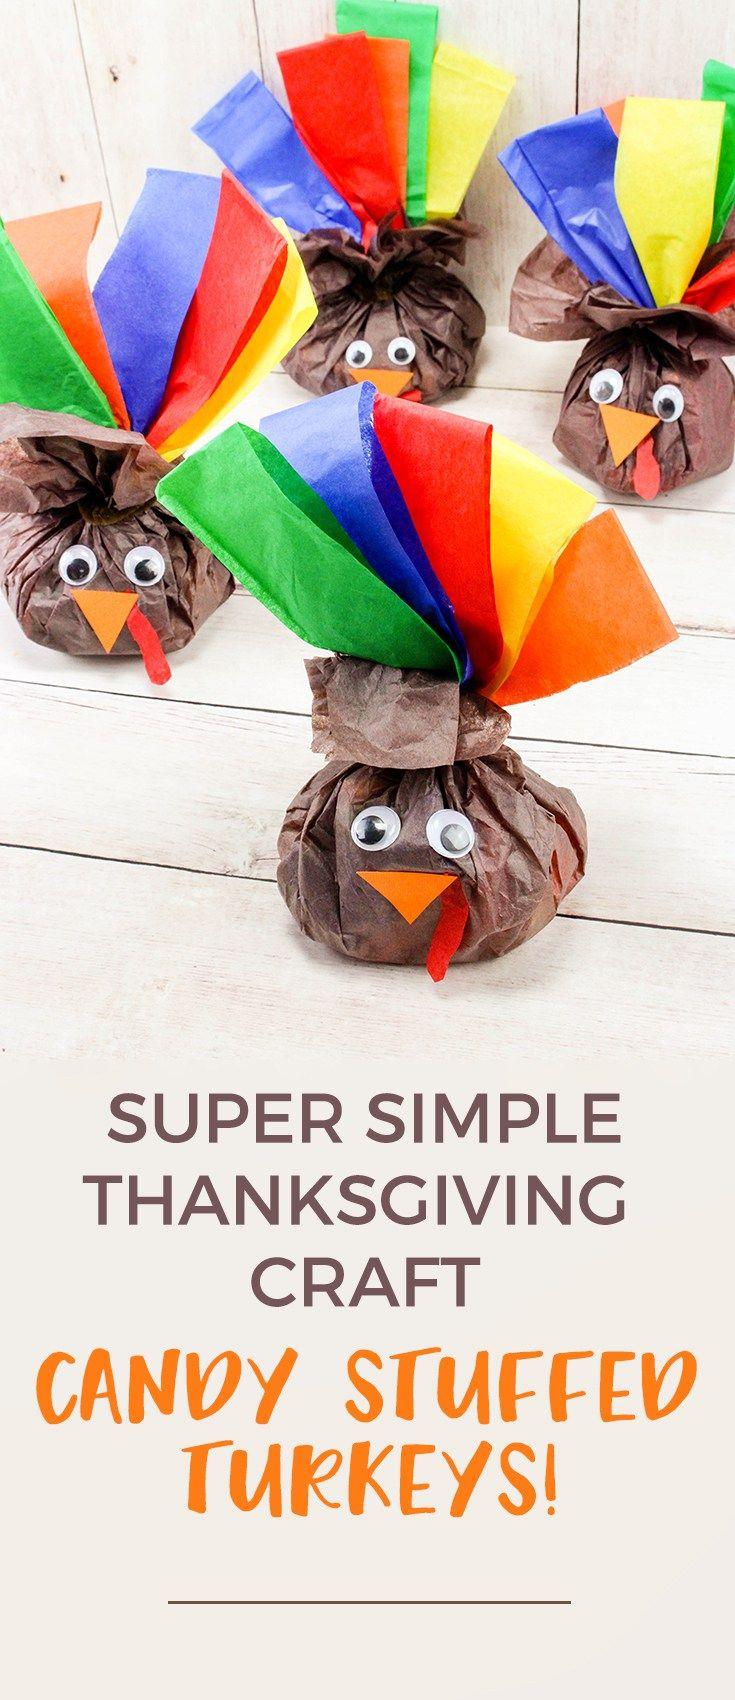 Thanksgiving Craft Candy Stuffed Turkey